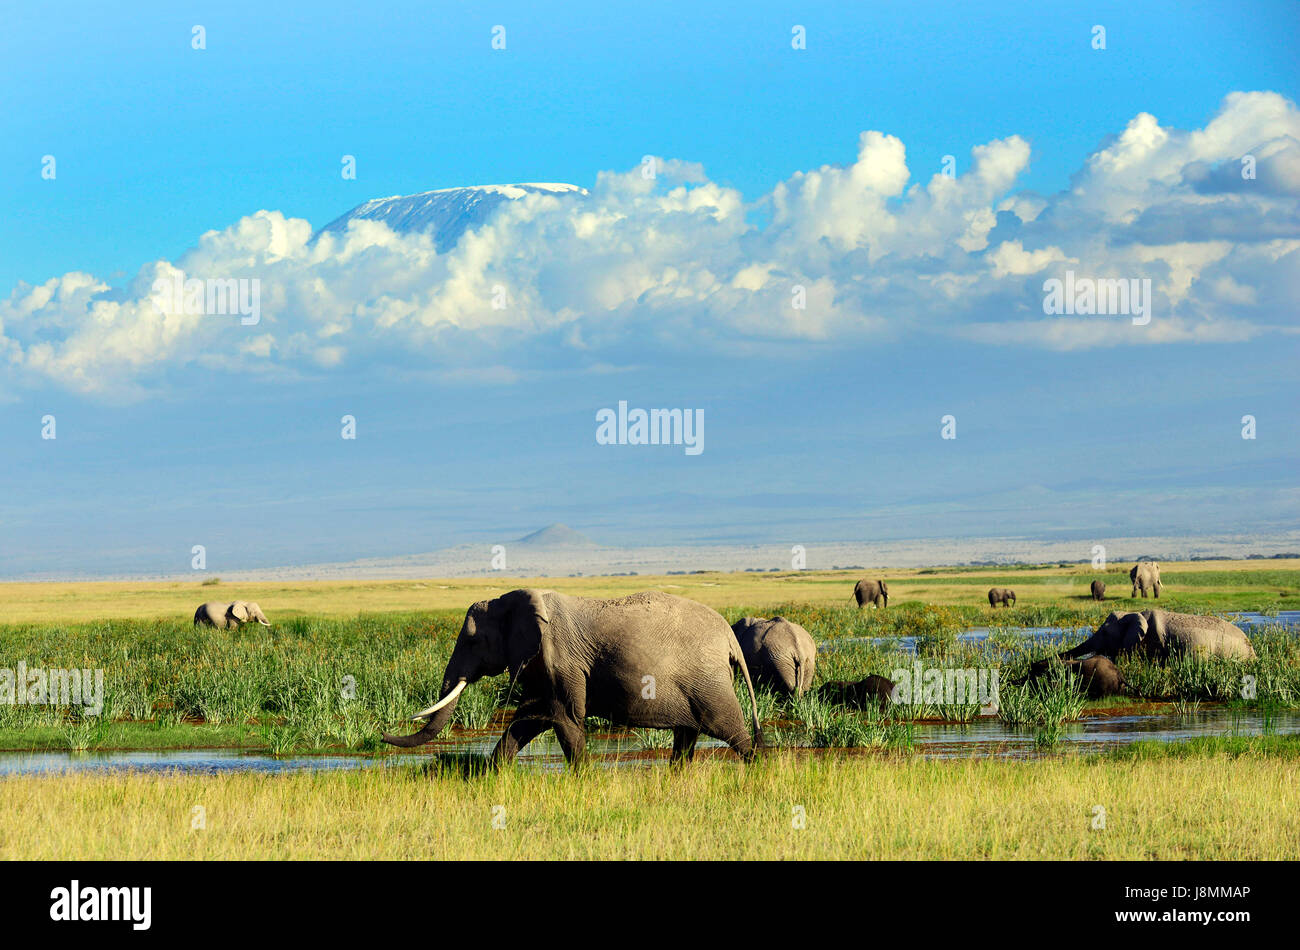 A herd of African elephants roaming the savanna below Mount Kilimanjaro in Amboseli national park in Kenya. - Stock Image